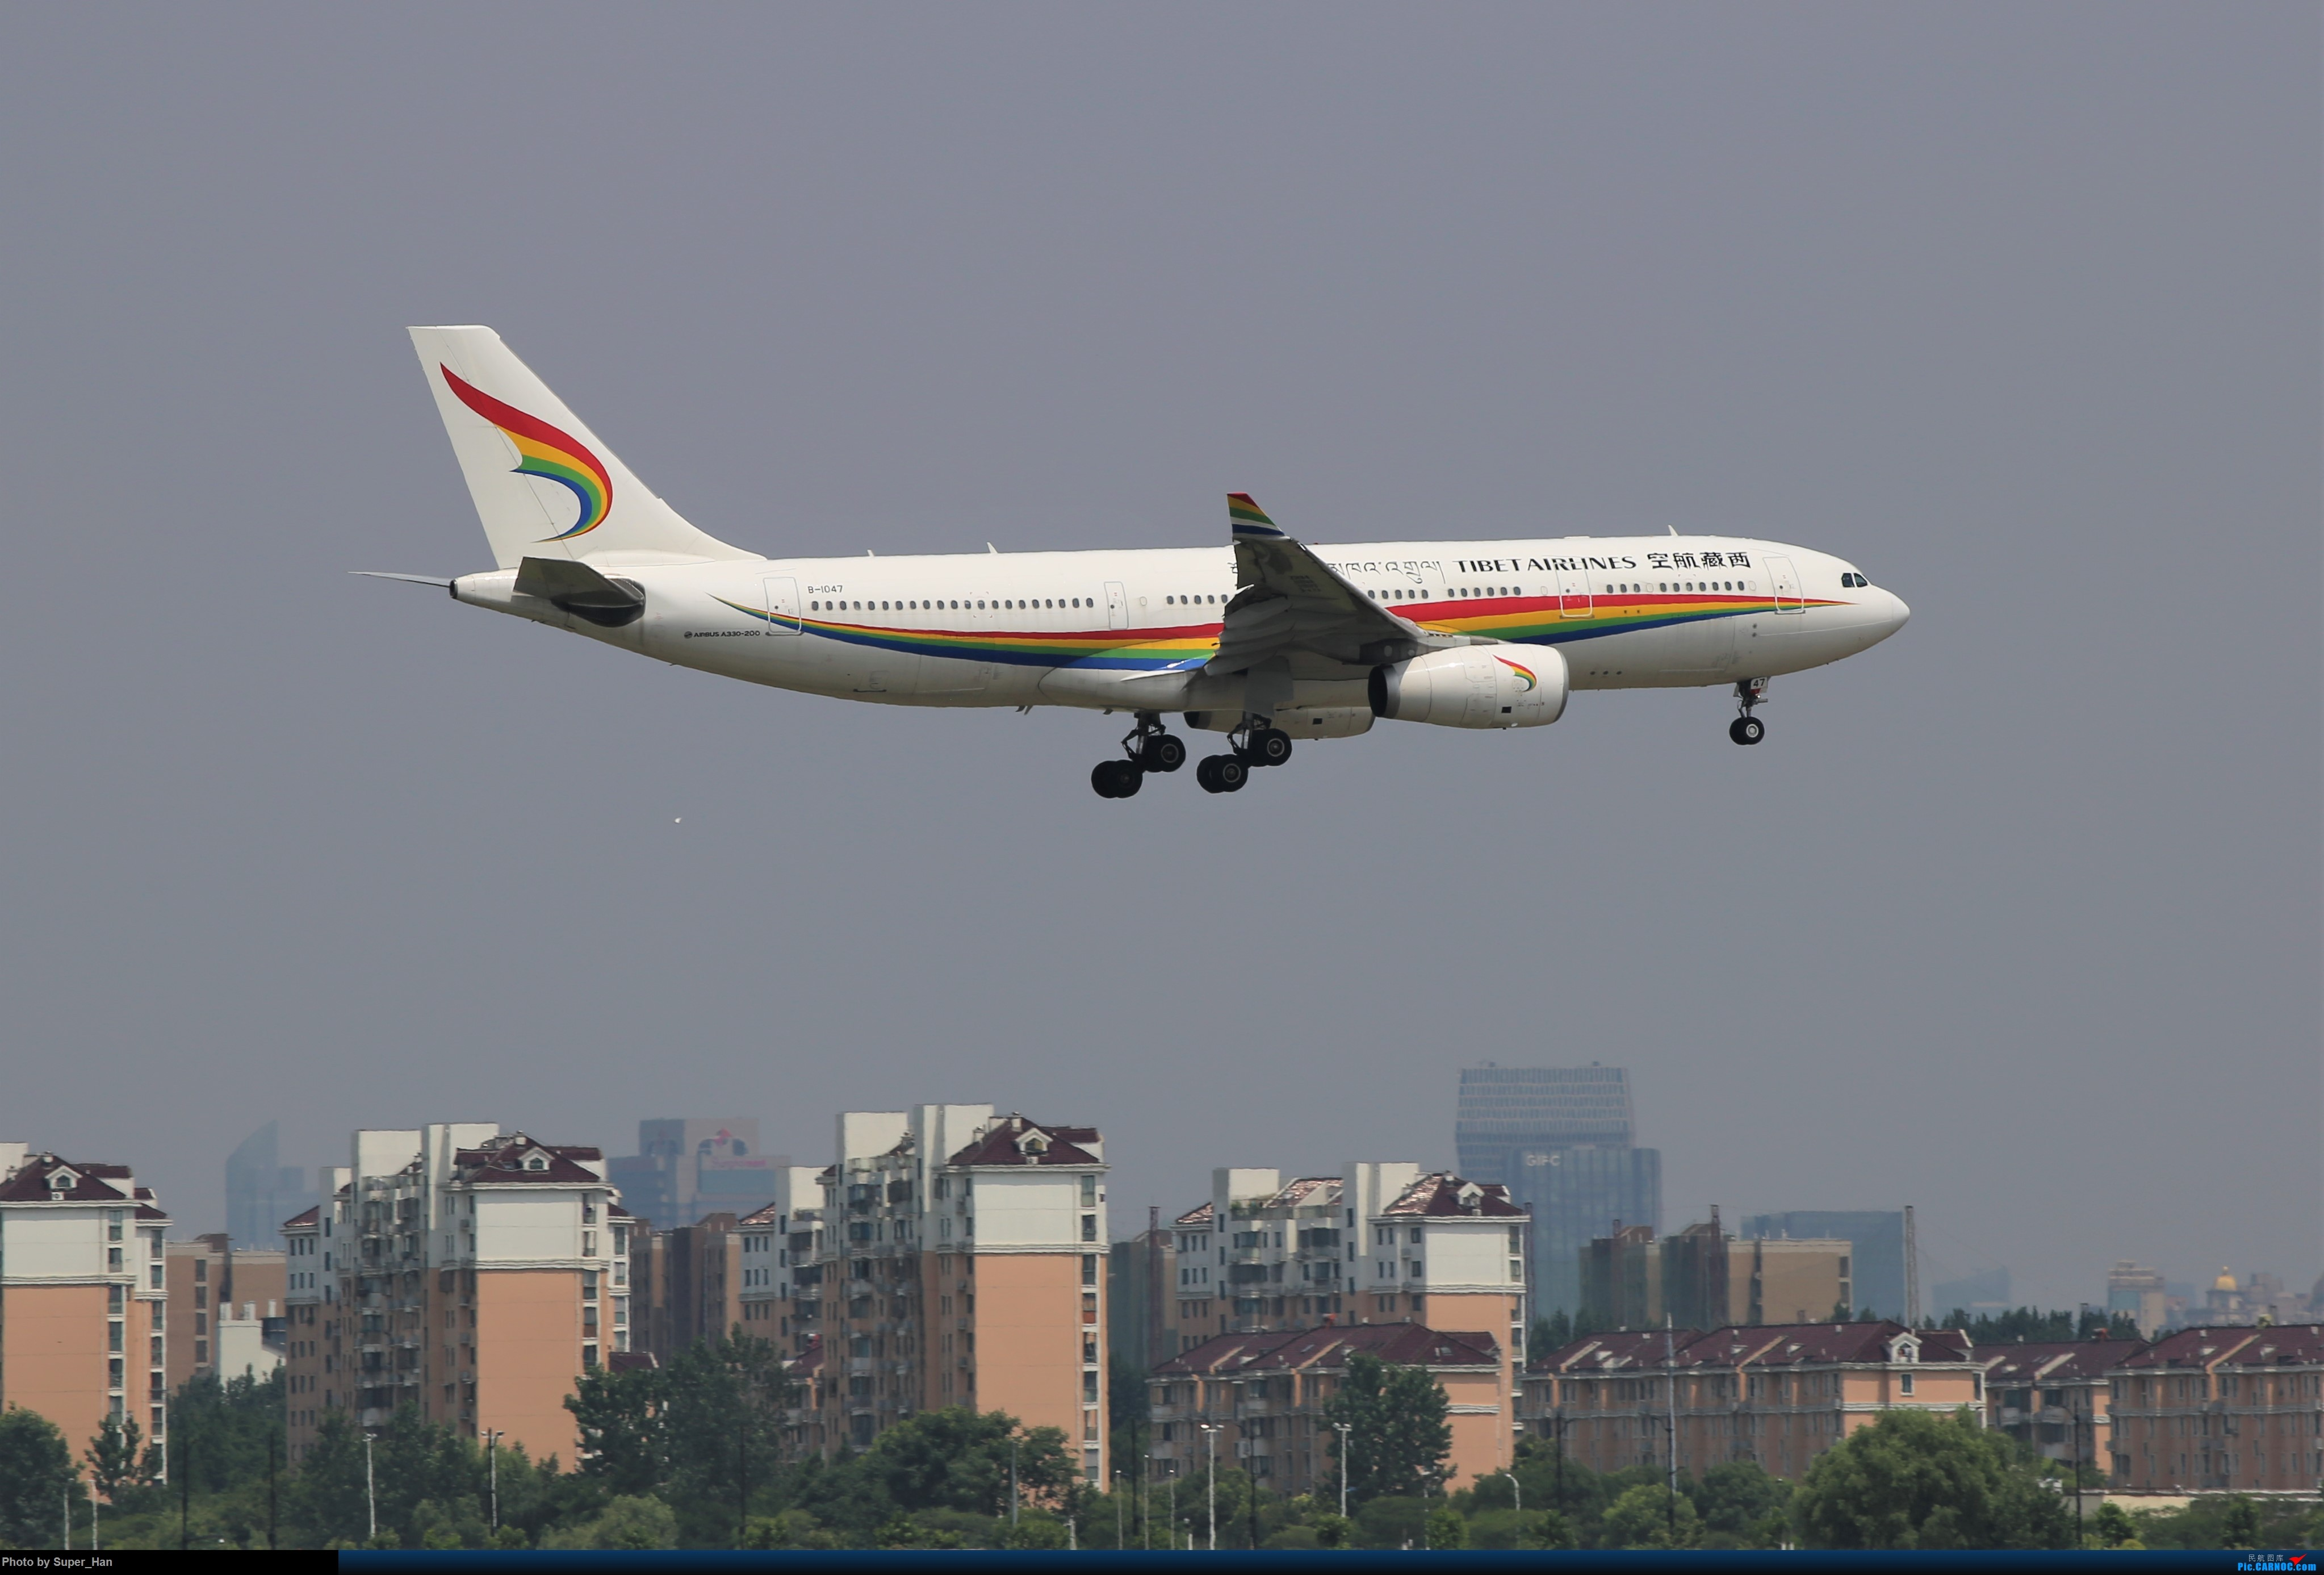 Re:[原创]0715去虹桥说走就走【最多的330篇】 AIRBUS A330-200 B-1047 中国上海虹桥国际机场